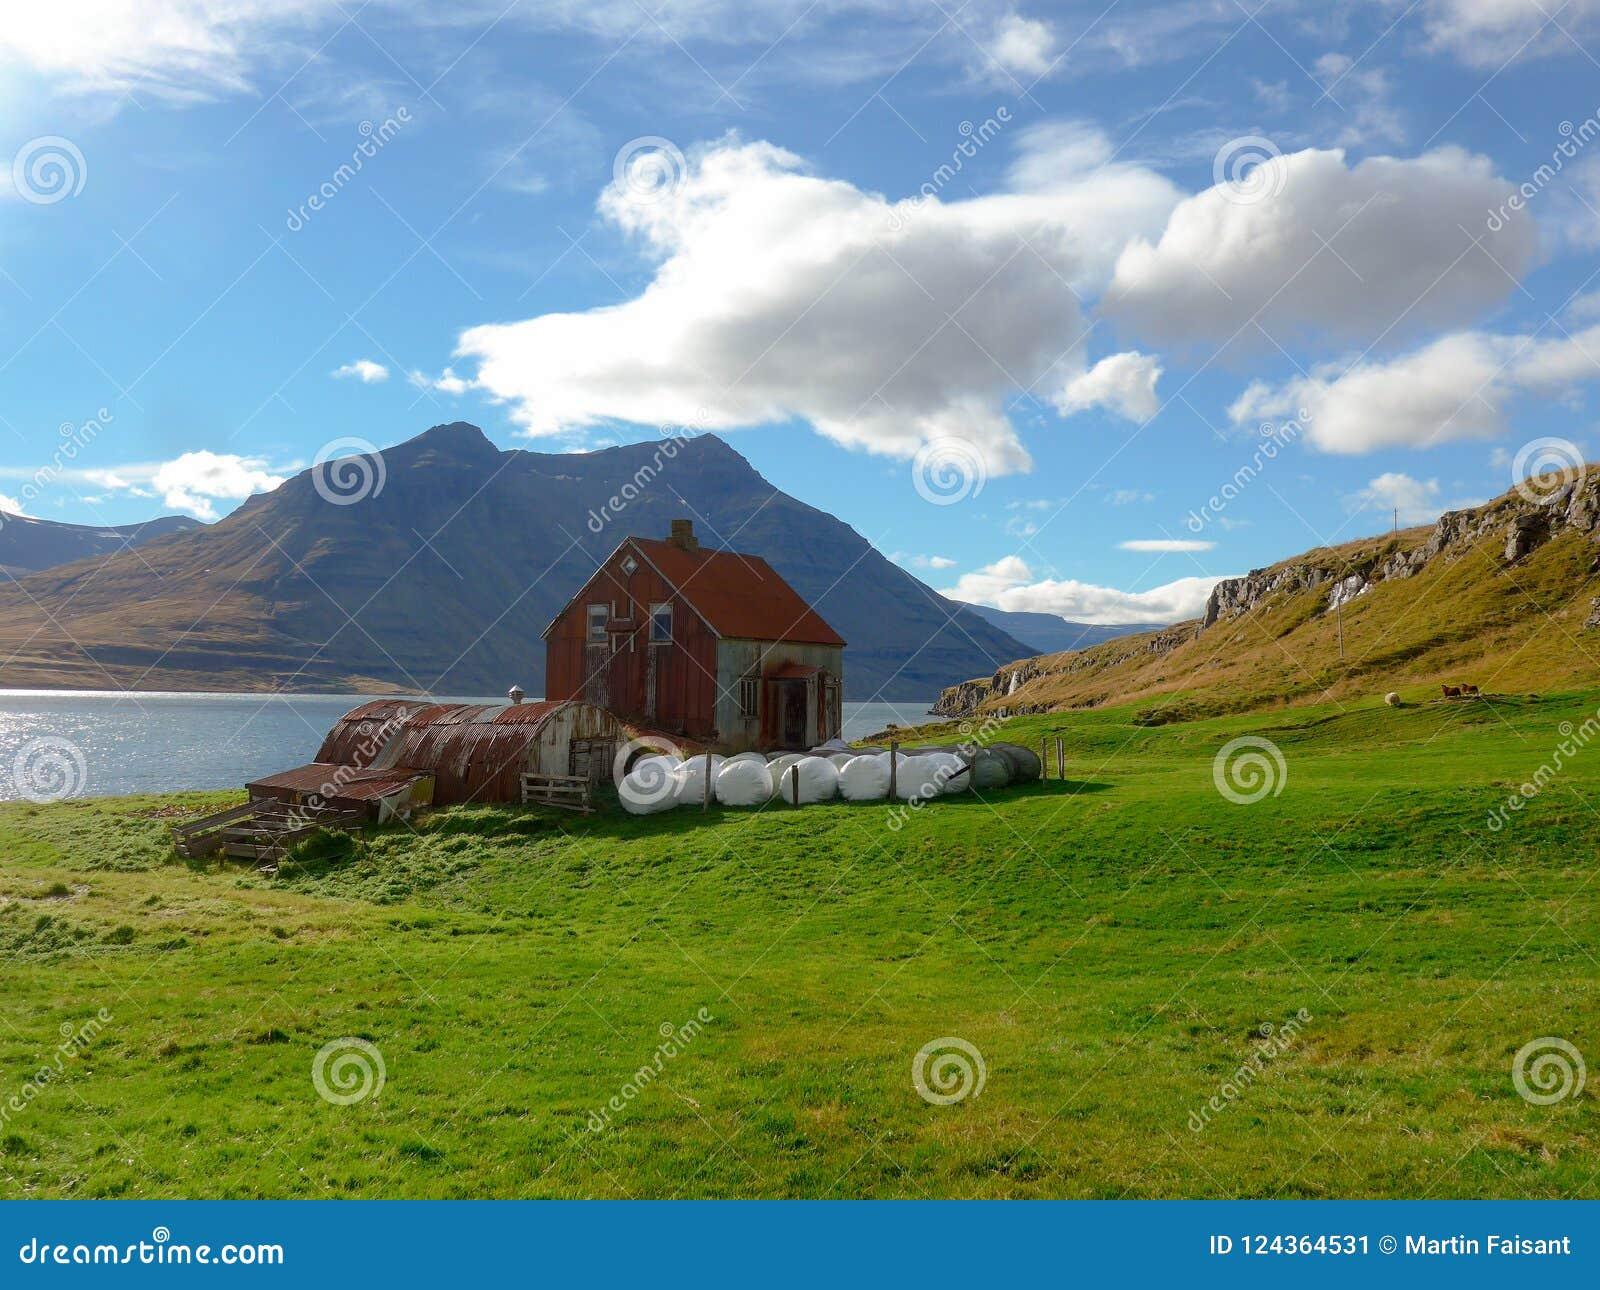 Azienda agricola nel fiordo di Seyðisfjörður in Islanda